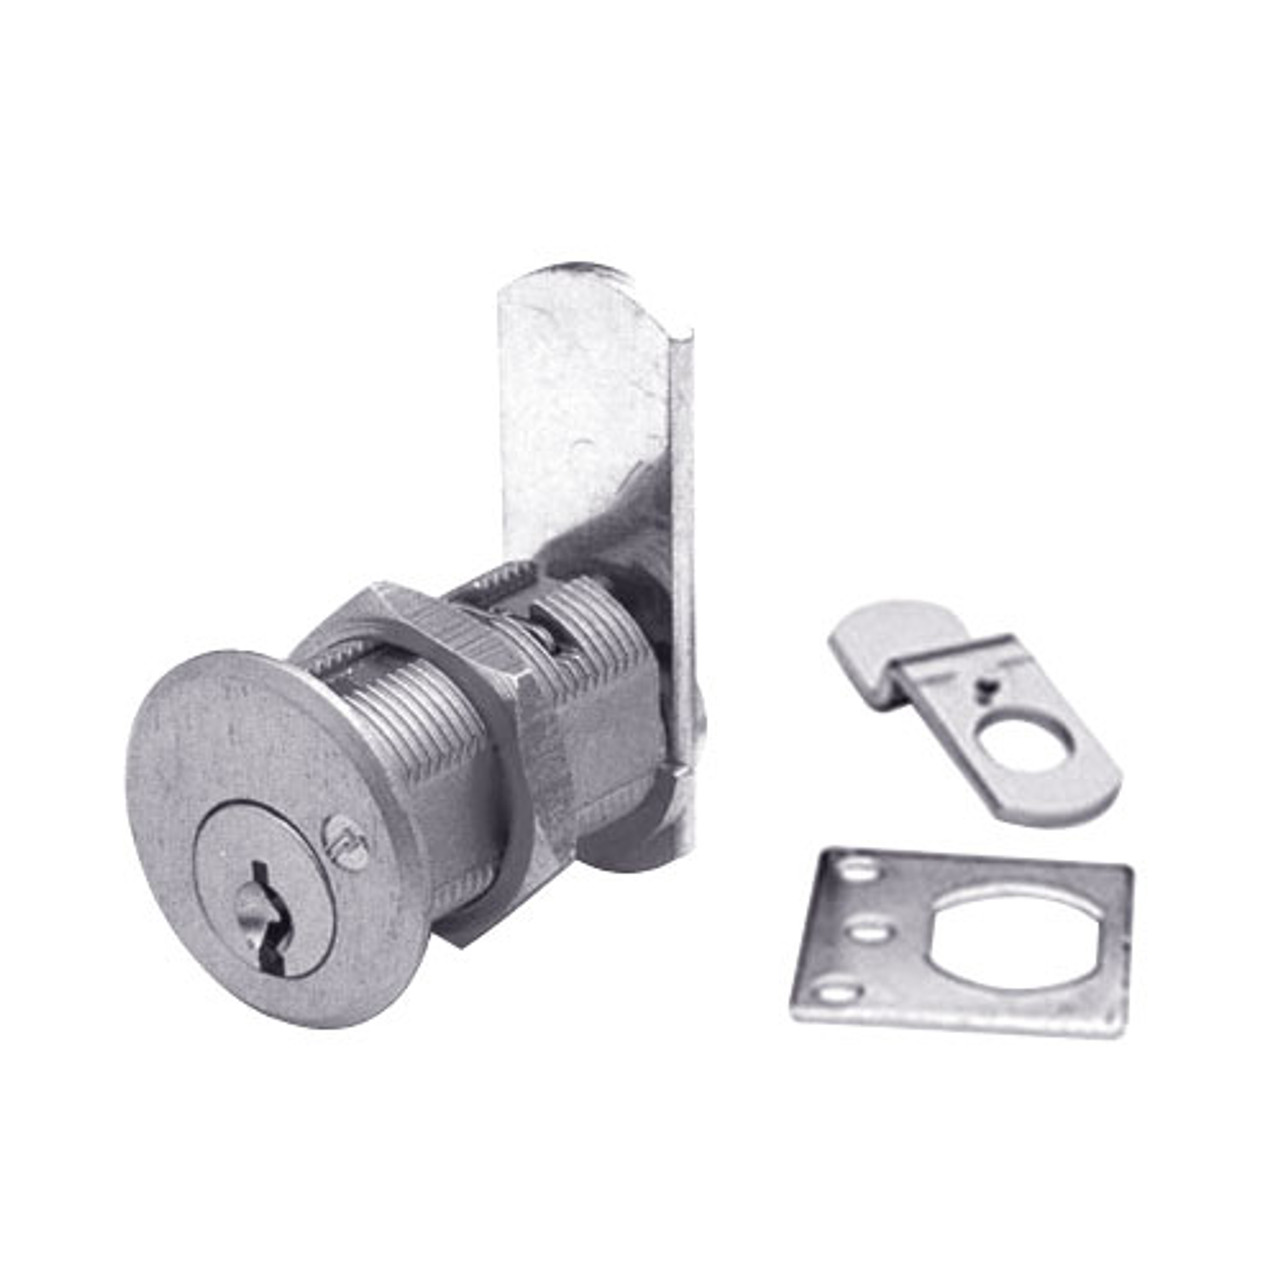 Olympus DCR2-KD-26D Cam Locks in Satin Chrome Finish